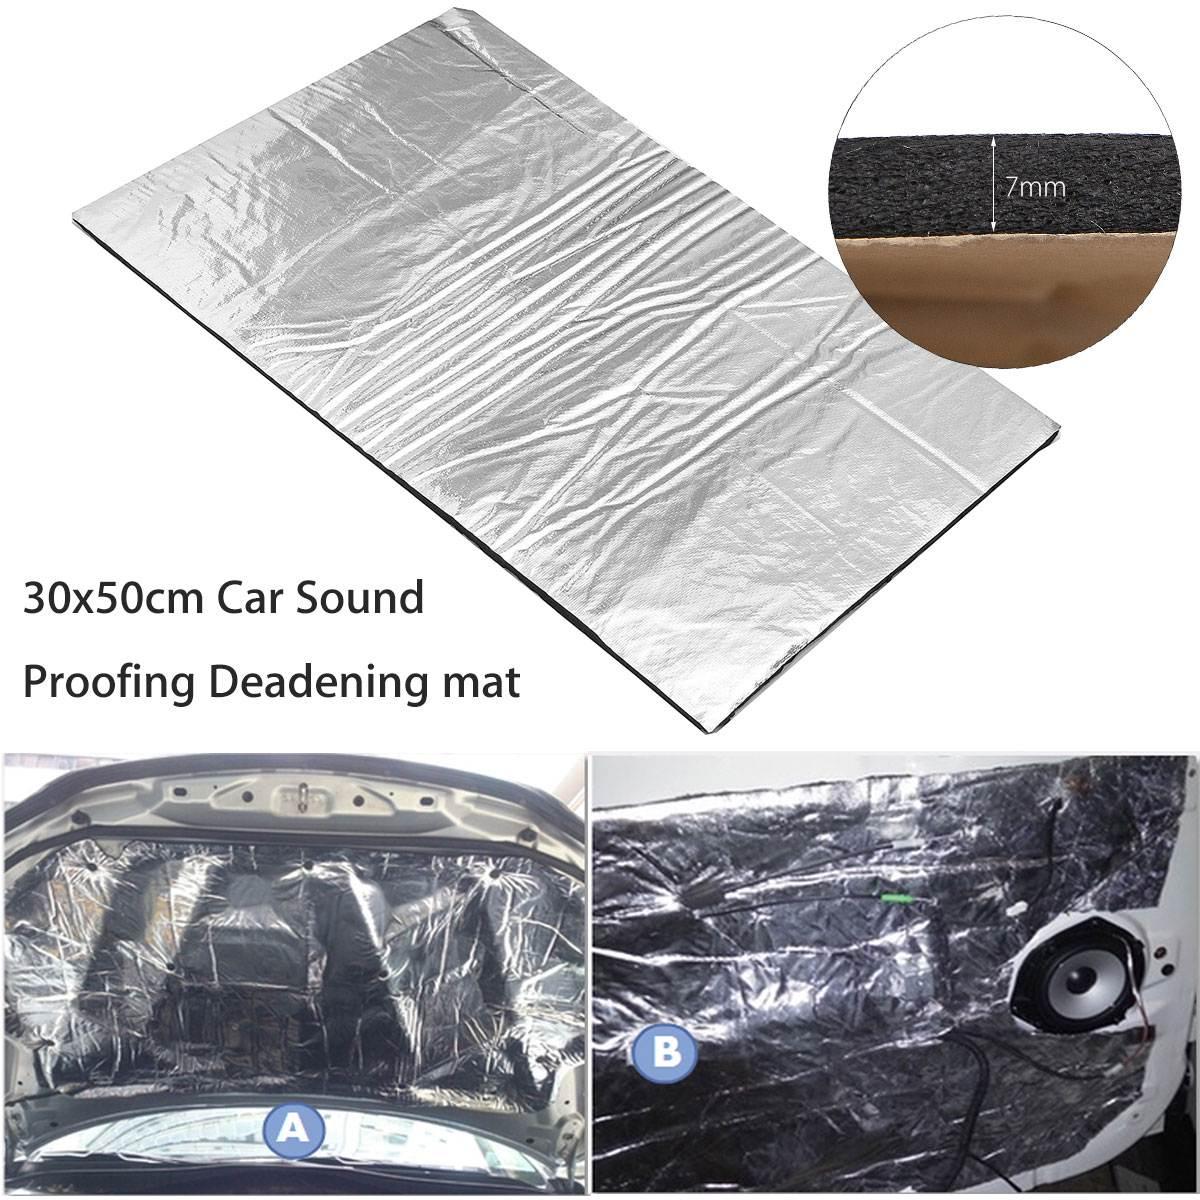 7mm 30x50cm Auto Sound Deadener Matte Noise Motorhaube Isolierung Trittschalldämmung Haube Motor Firewall Wärme Aluminium Schaum aufkleber